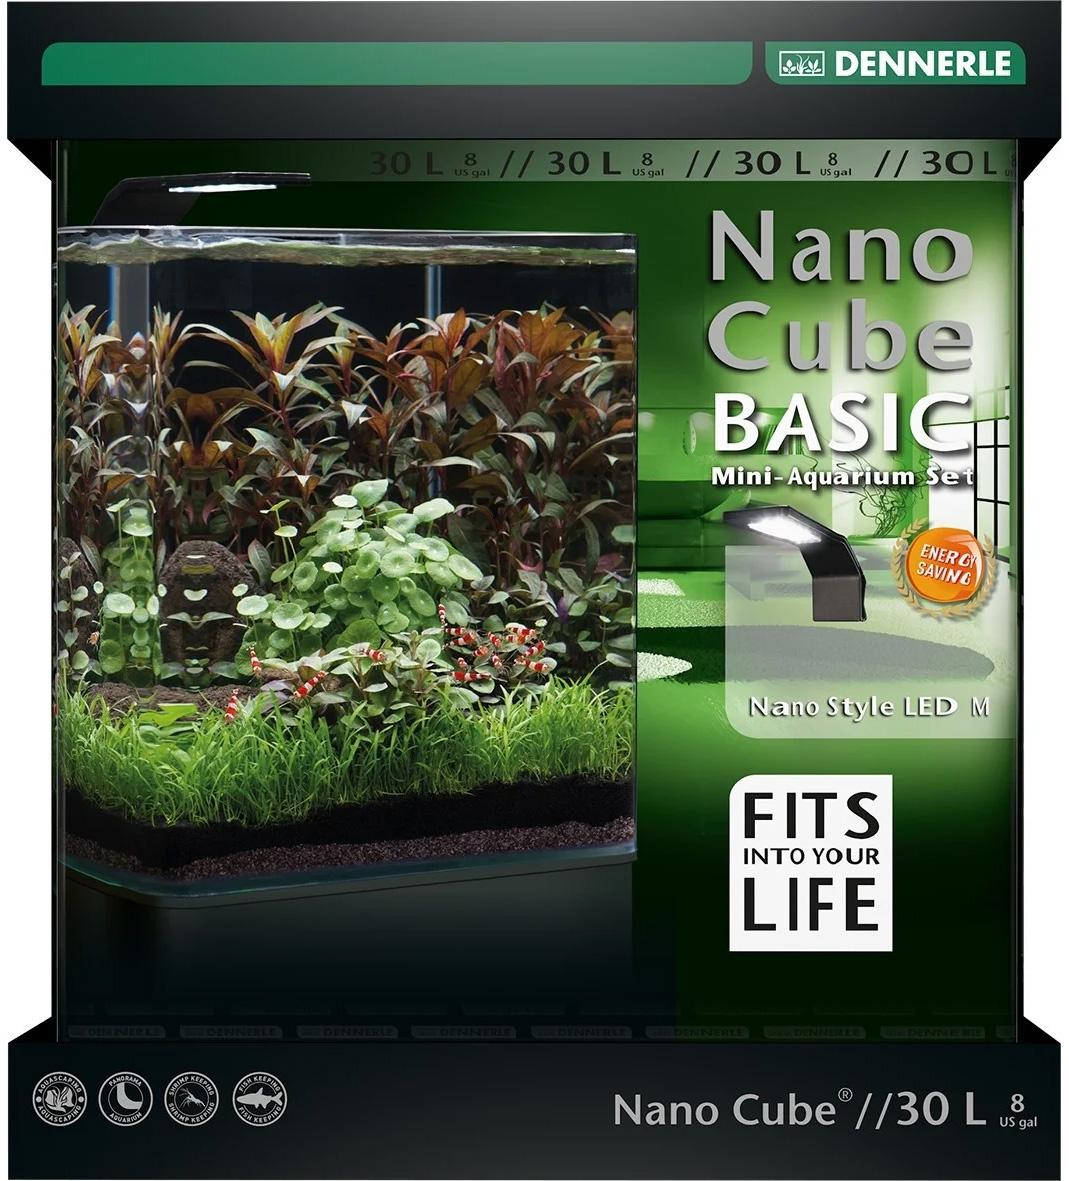 Аквариум Dennerle Nanocube Basis Style Led M 30 литров (1 шт)